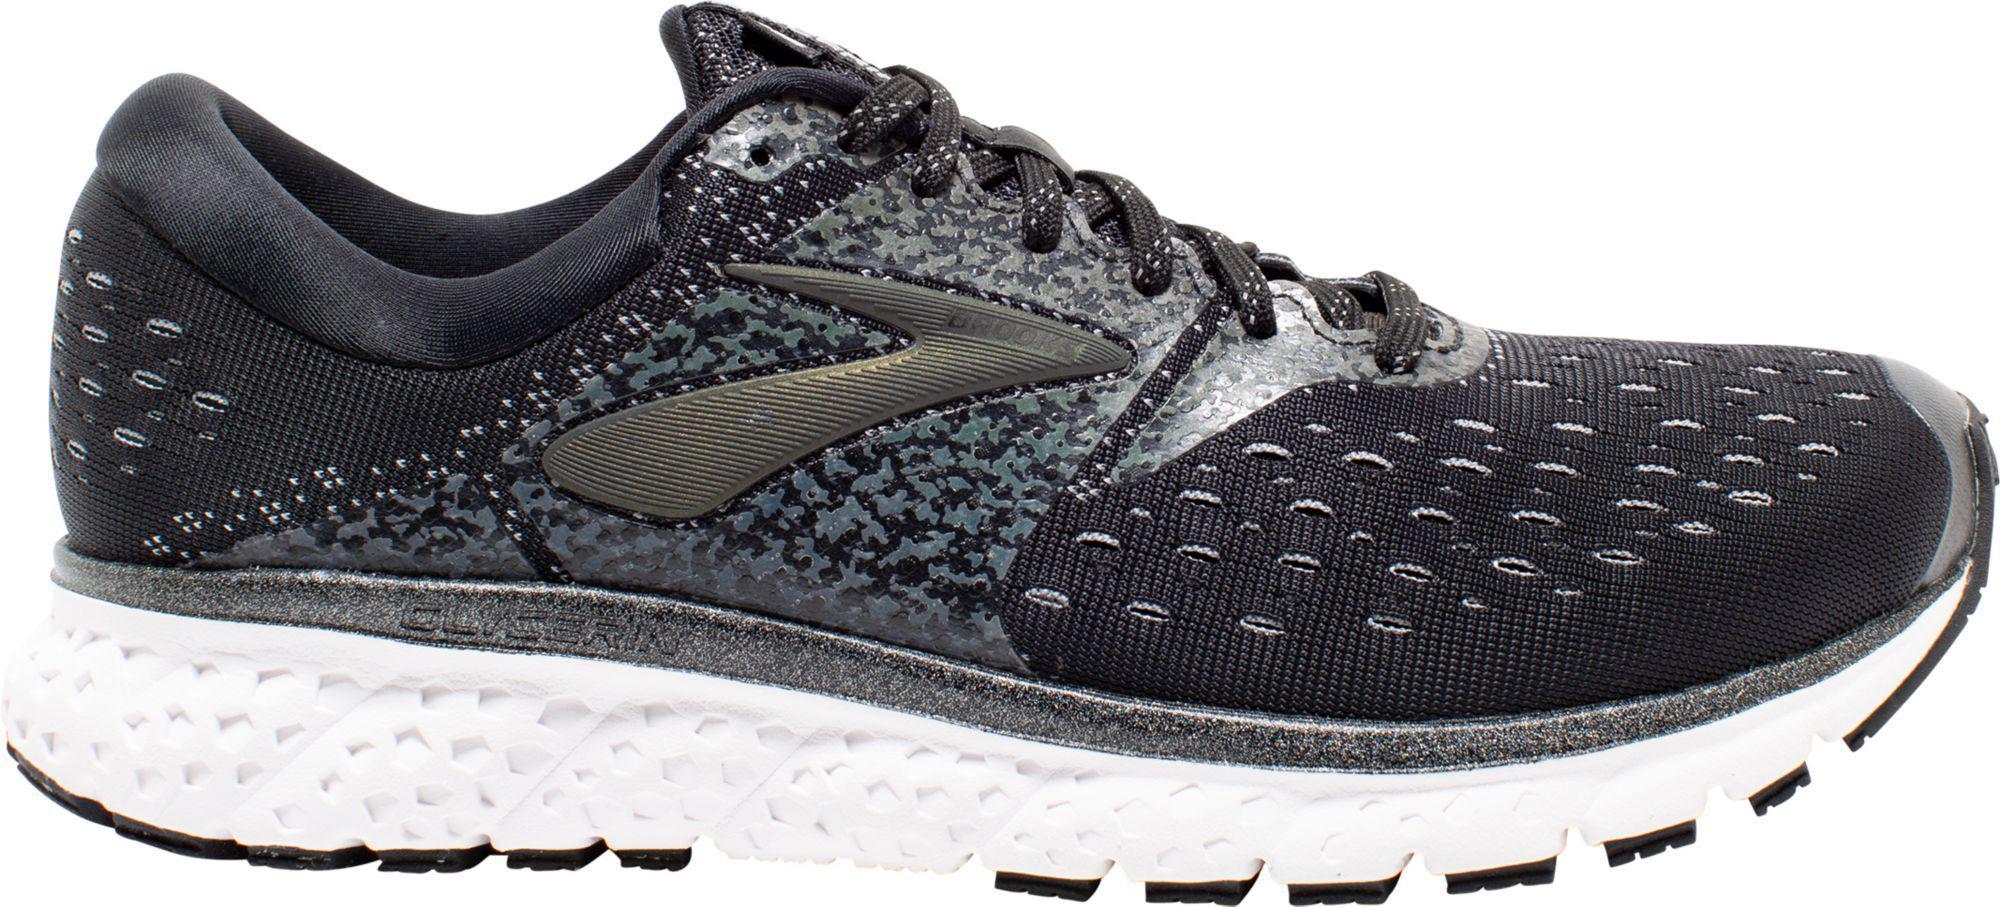 1ba578d450e Lyst - Brooks Glycerin 16 Reflective Running Shoes in Black for Men